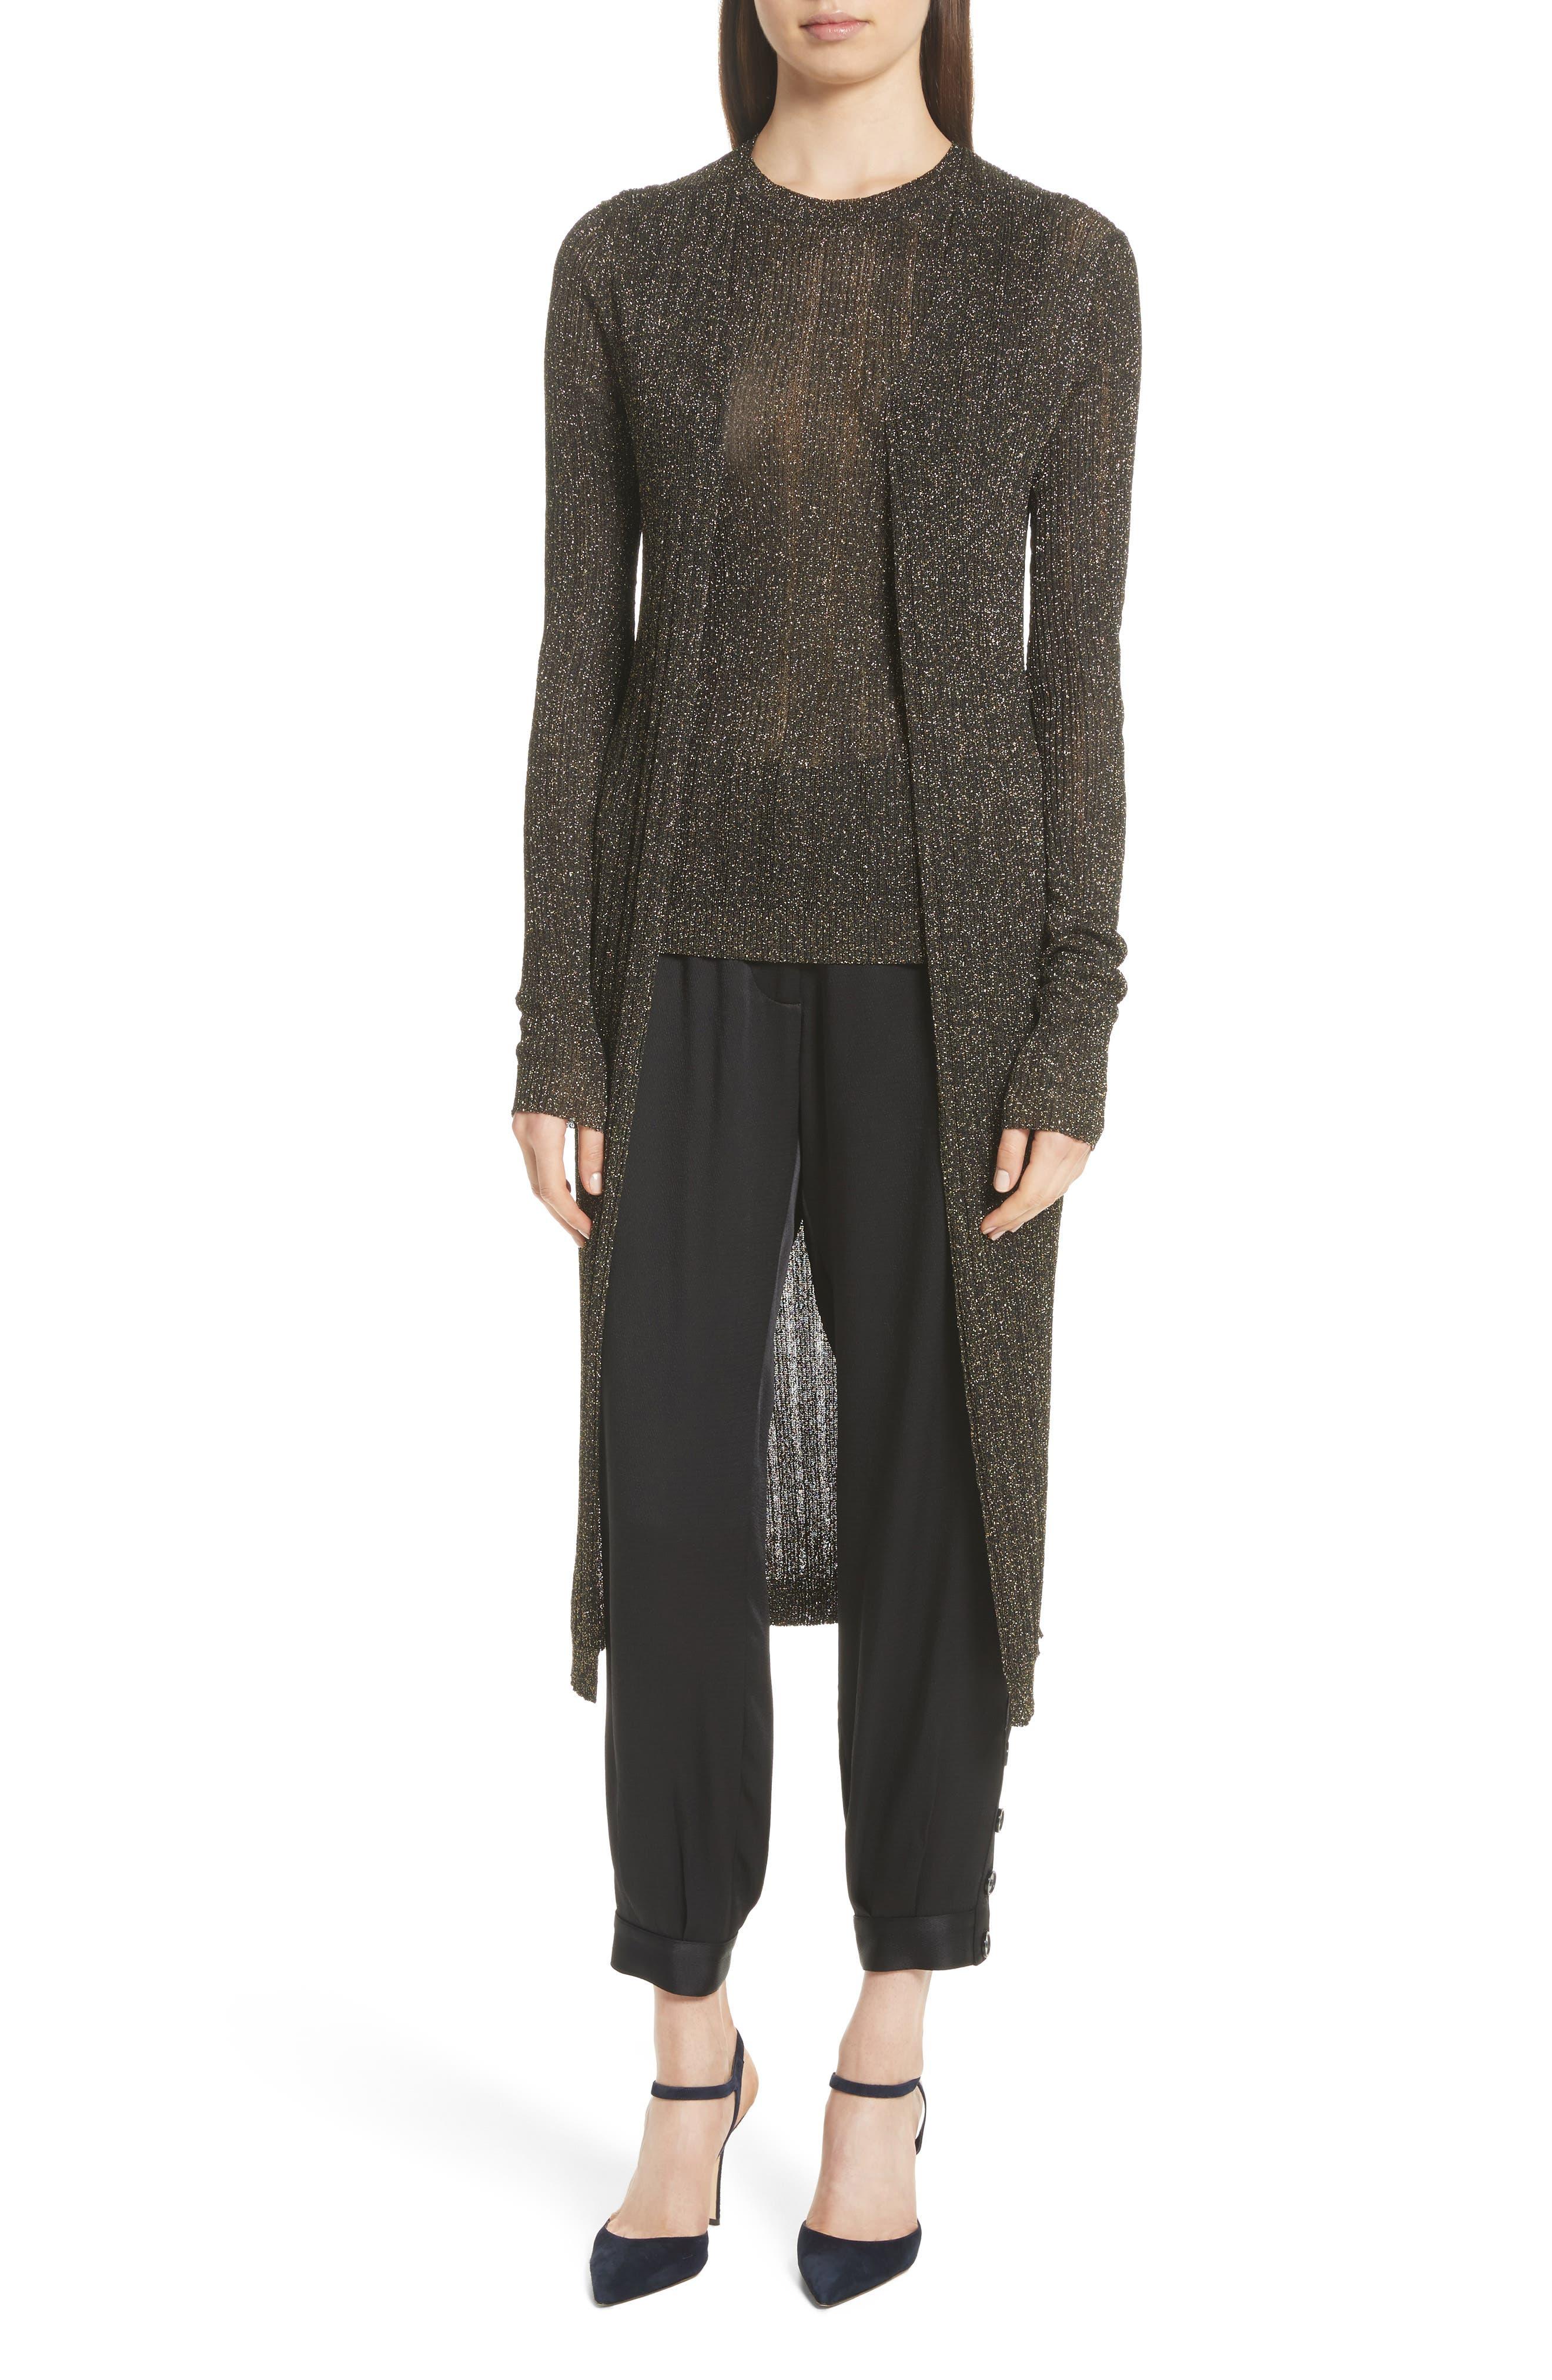 LaSalle Metallic Knit Long Cardigan,                         Main,                         color, Black And Gold Bag